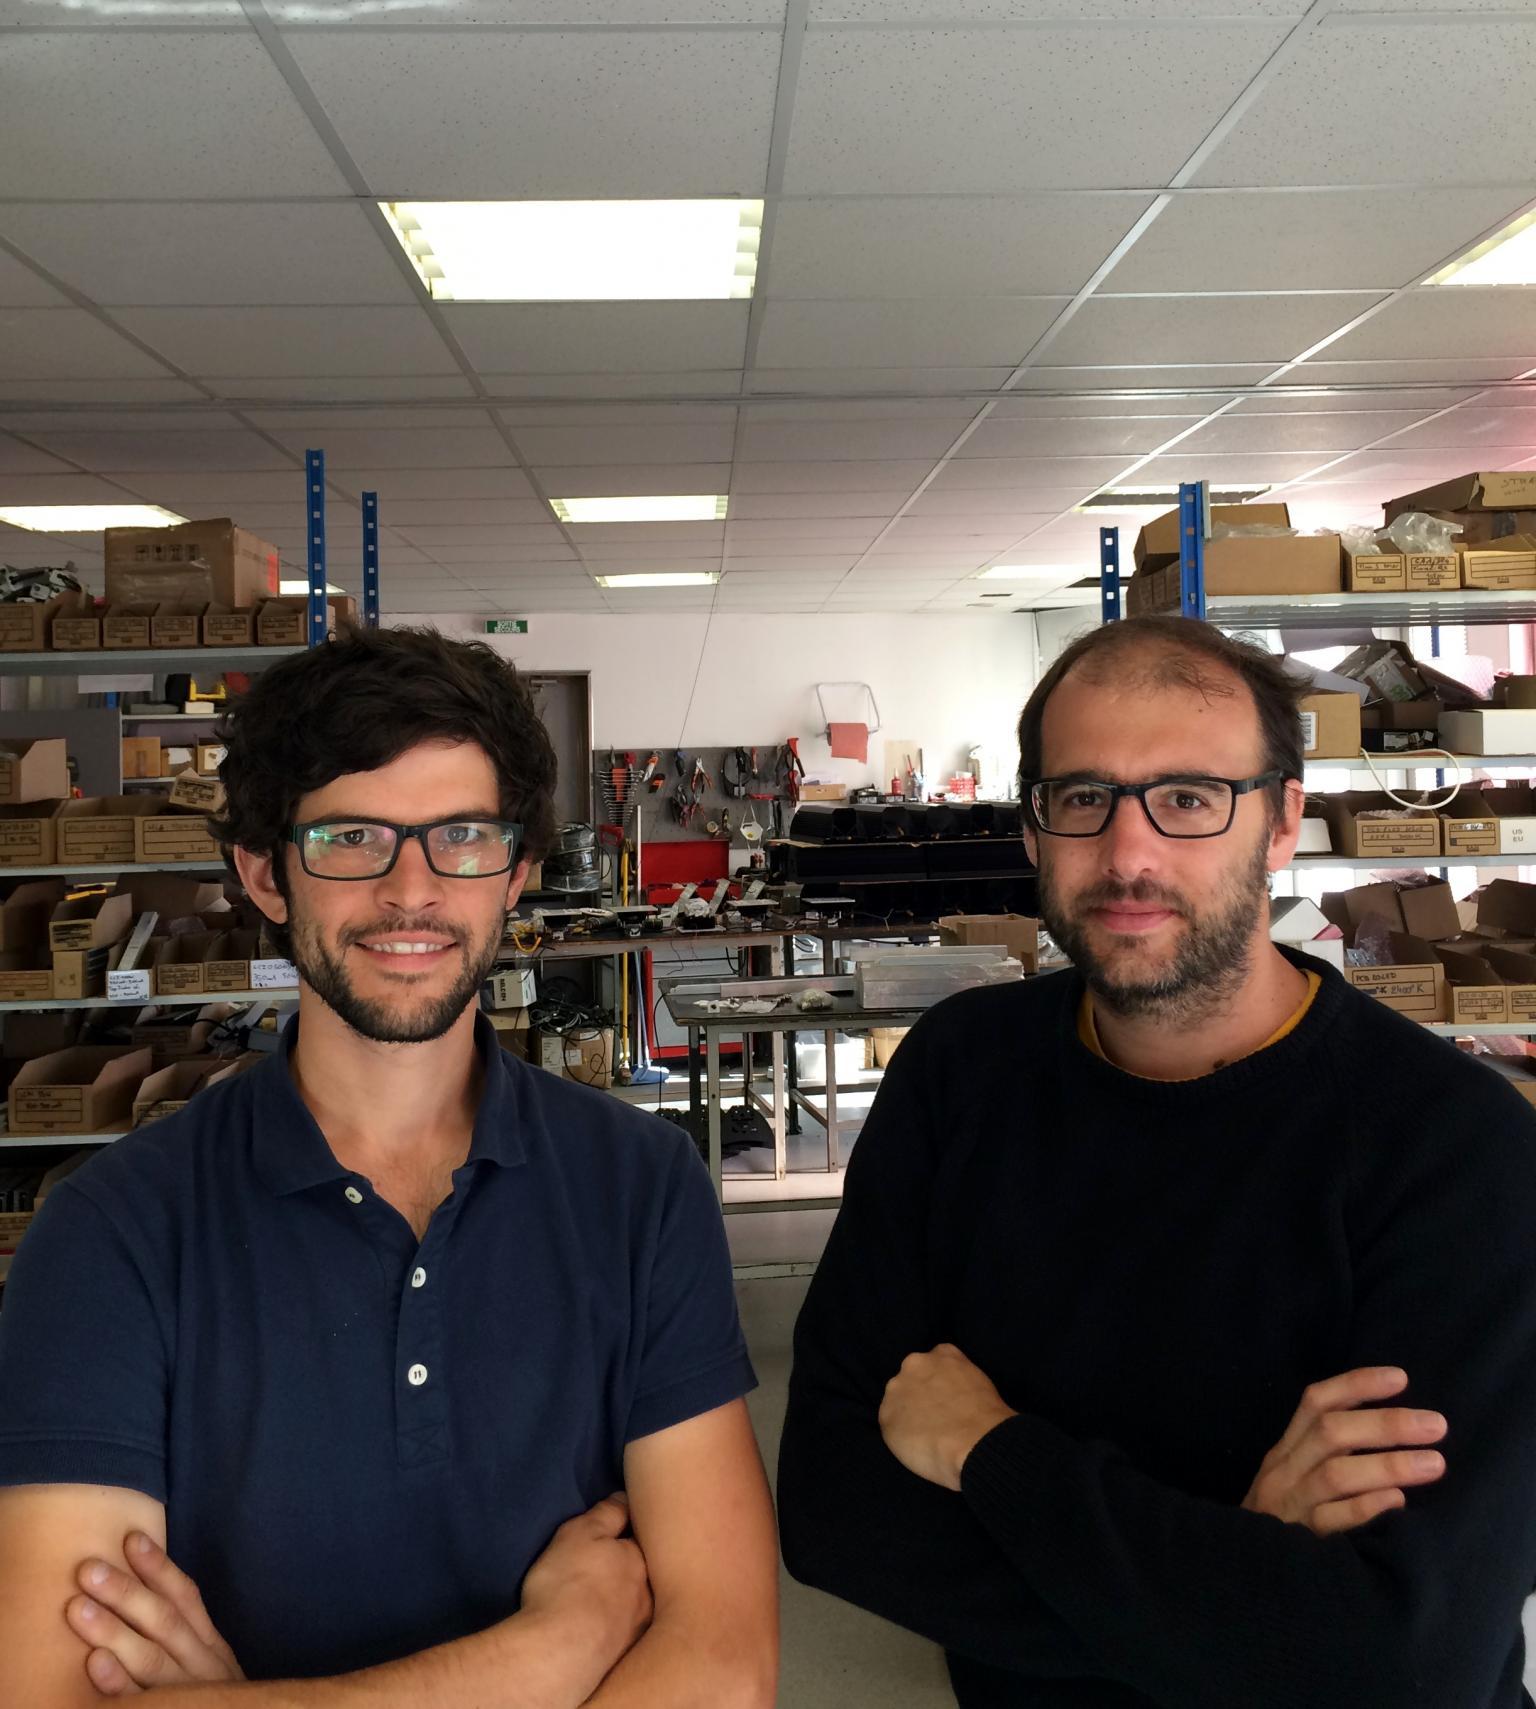 Alexandre Boullot and Bertrand Pellet